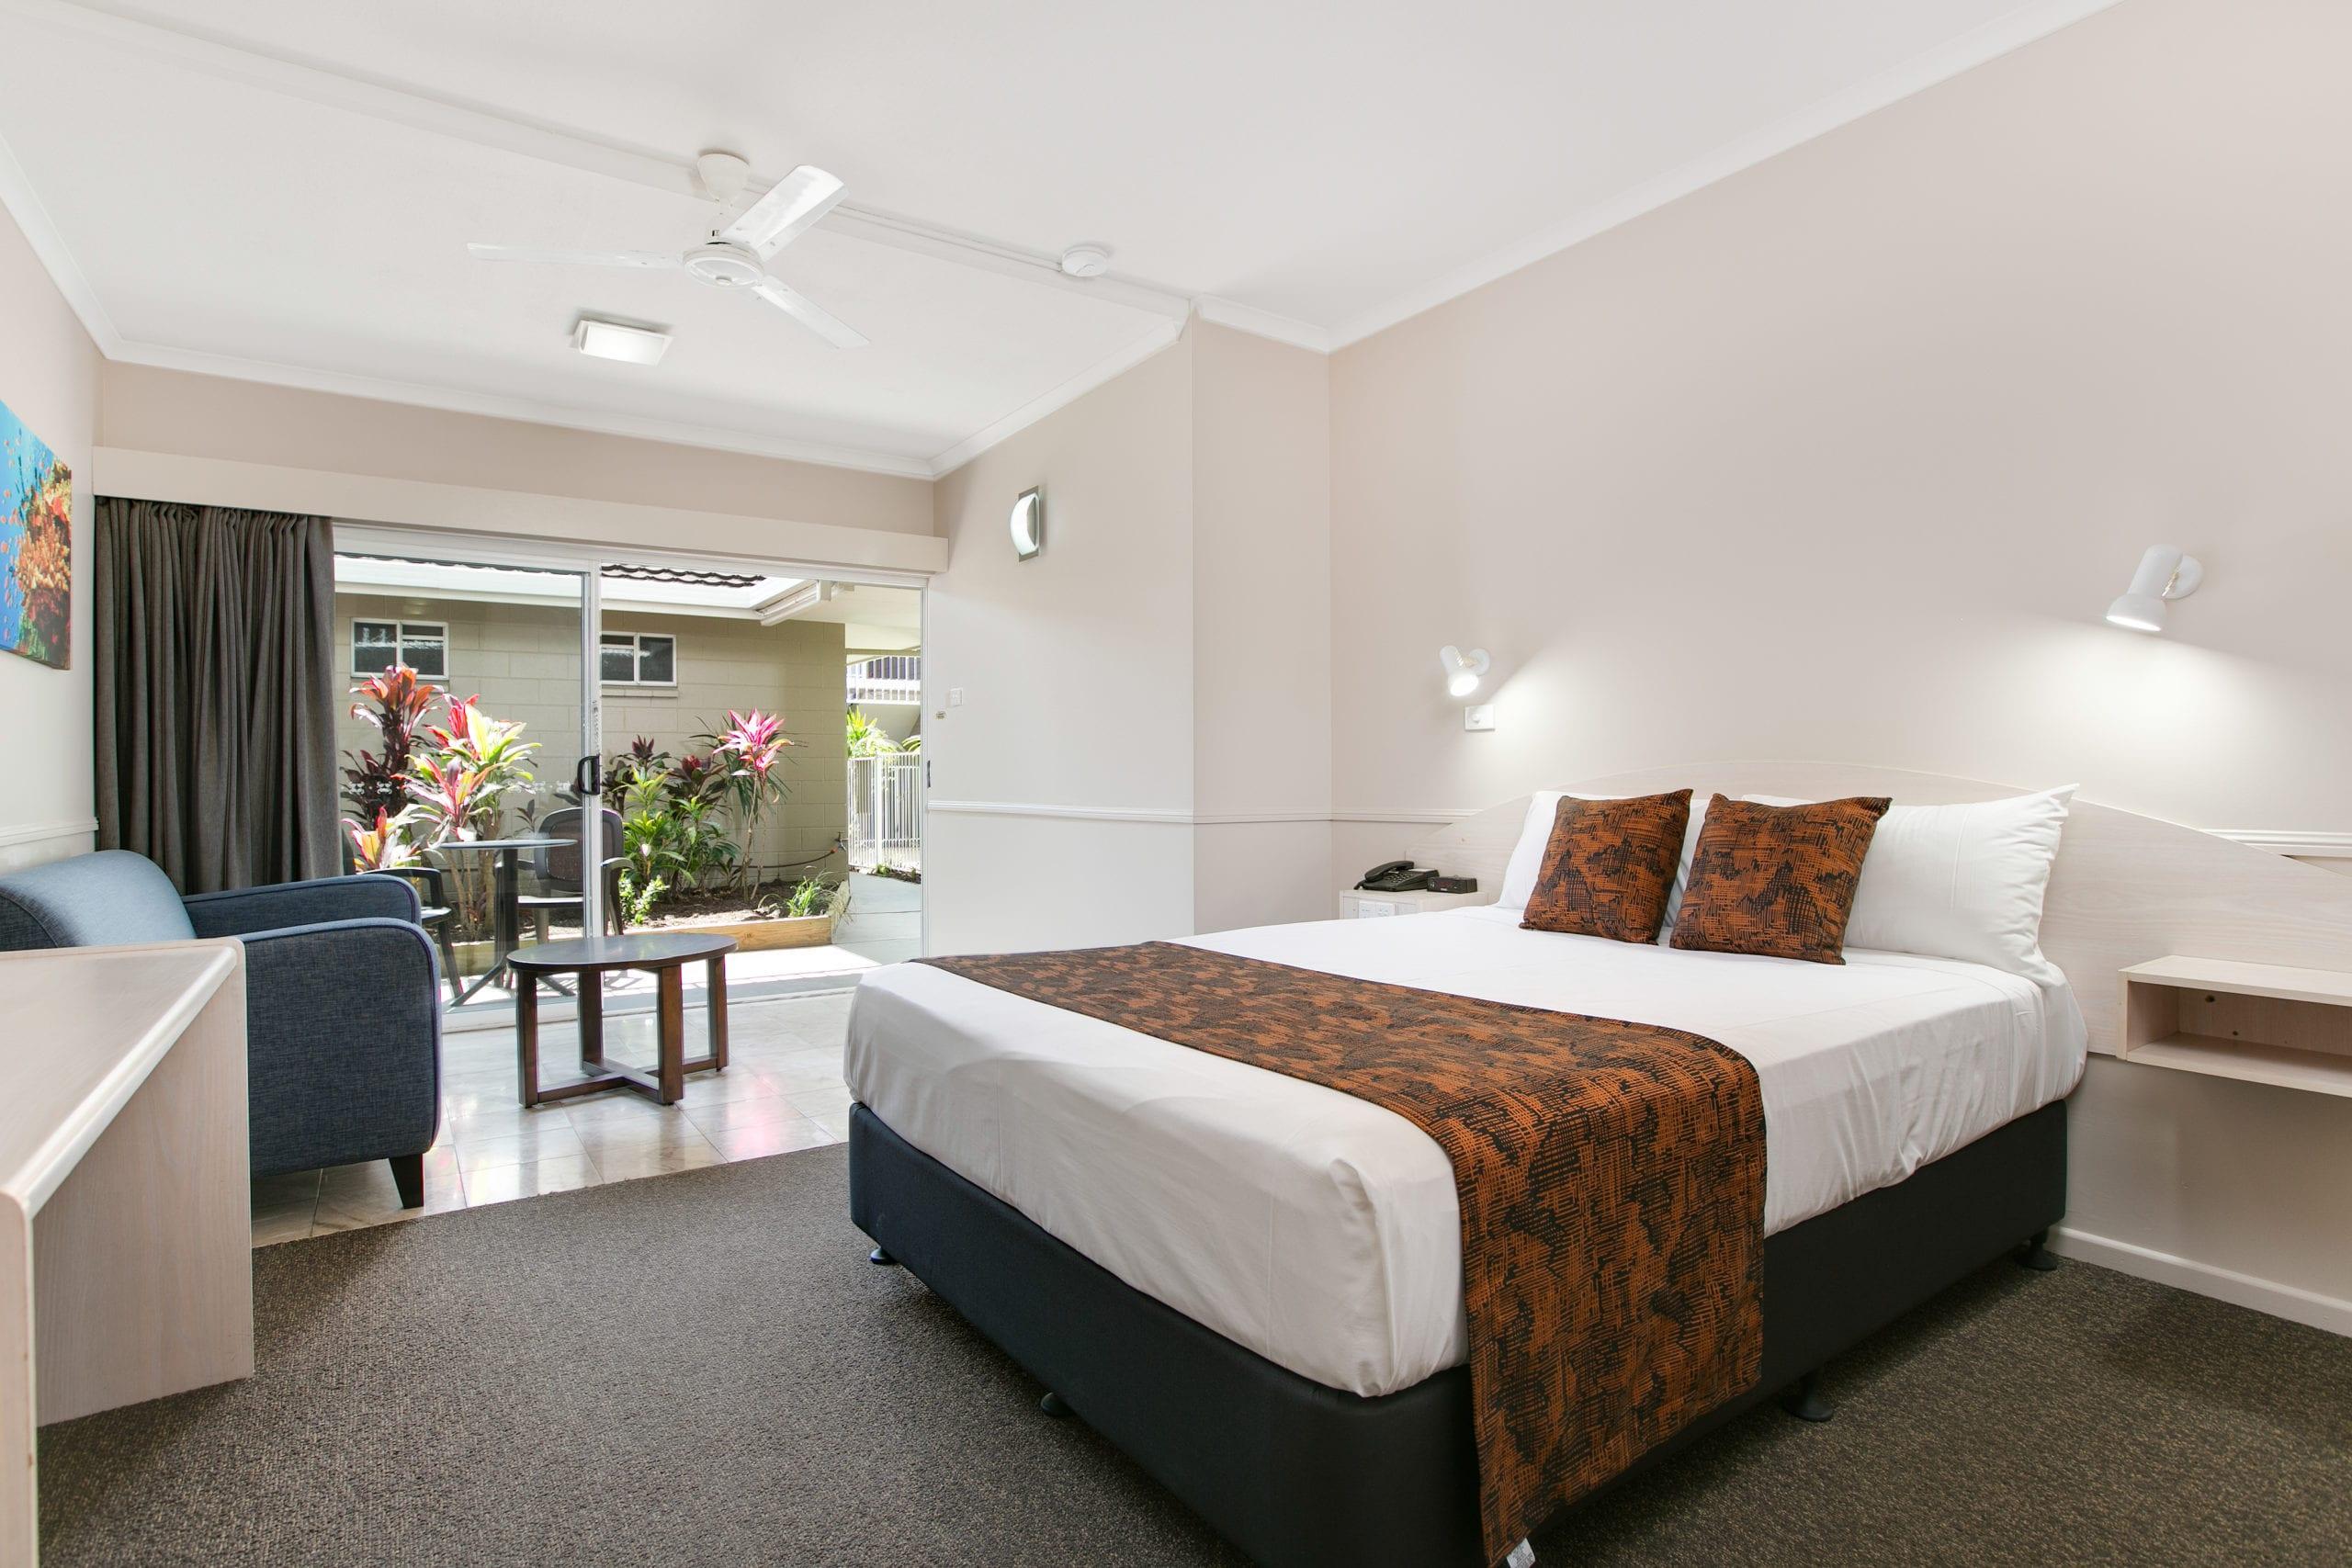 Superior-Room-2-scaled-1.jpg